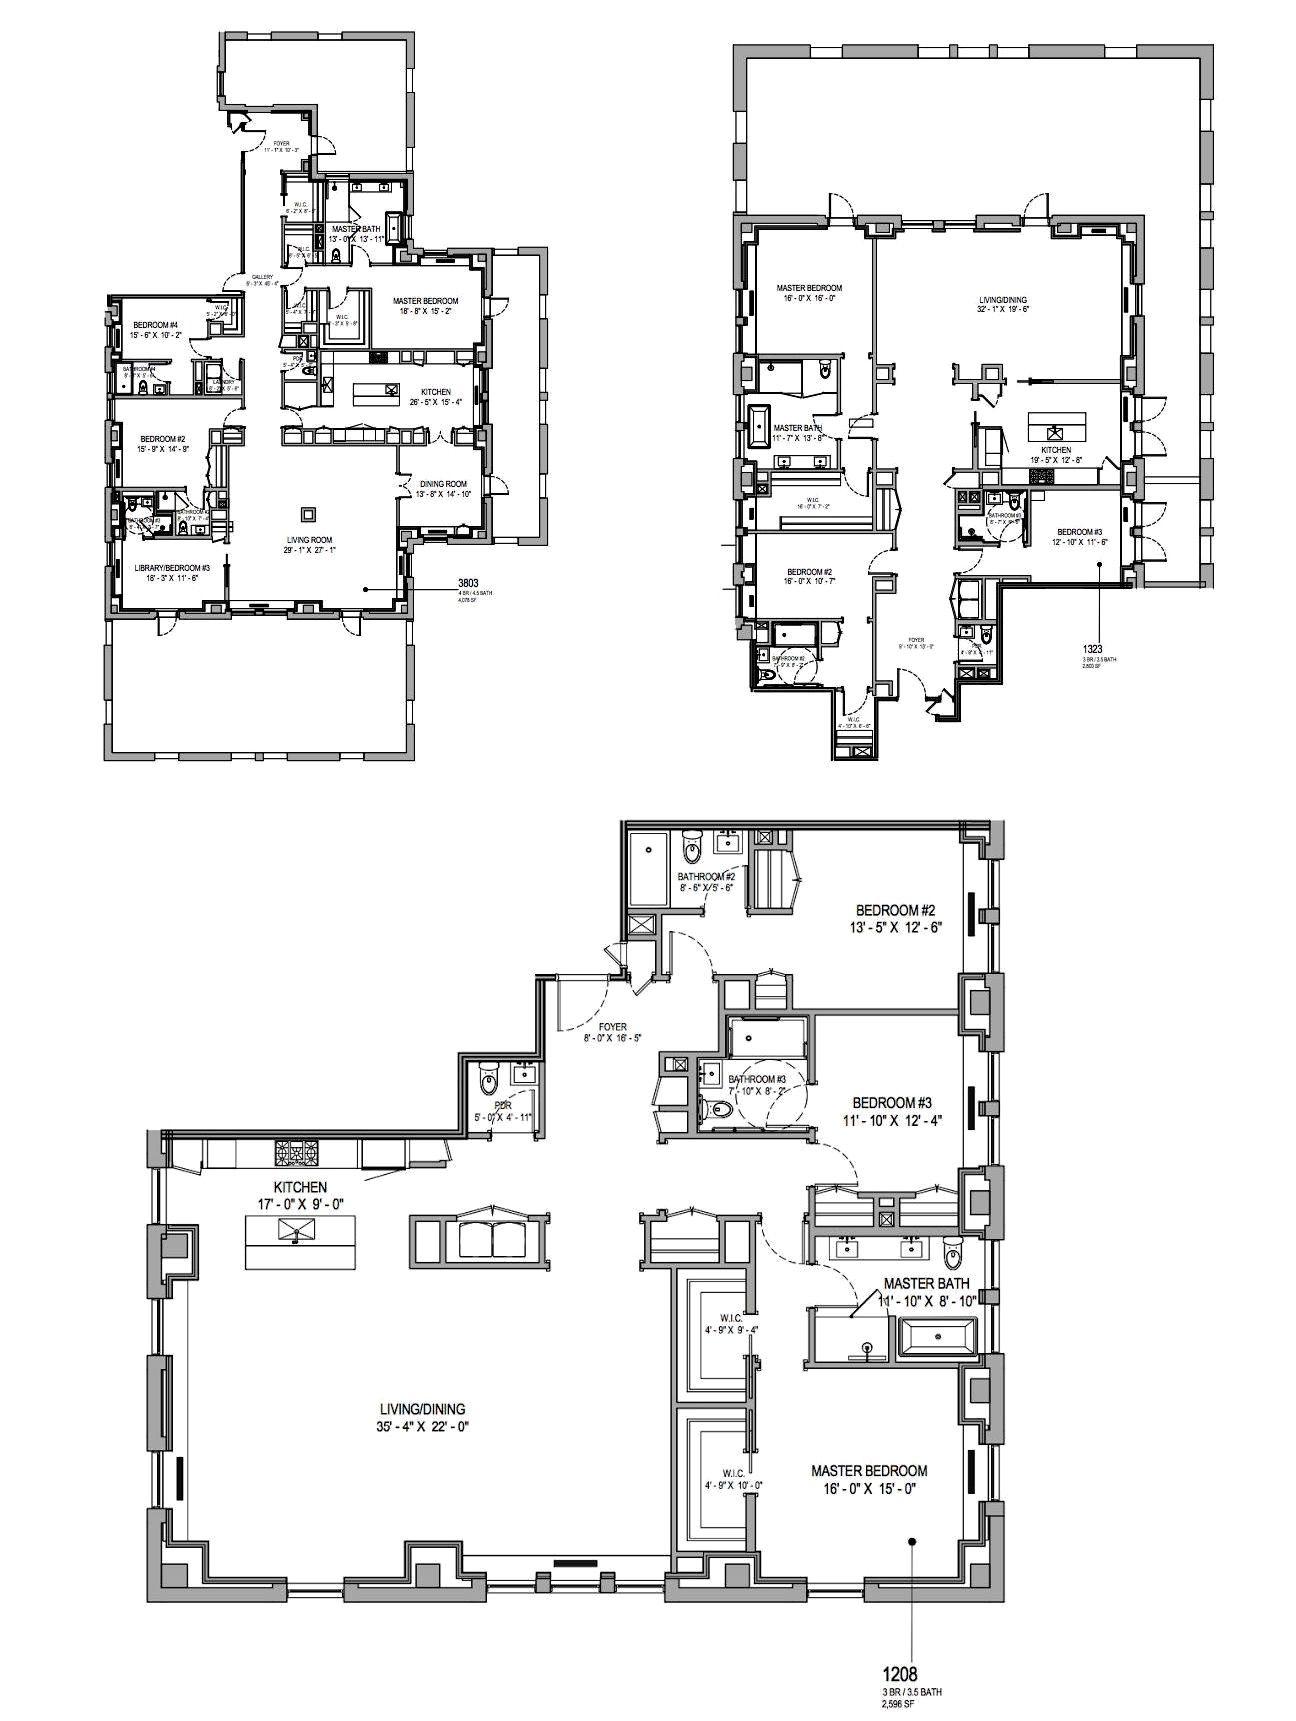 Revealed Here Are The Waldorf Astoria S Condo Floor Plans Condo Floor Plans Floor Plans Nyc Condo